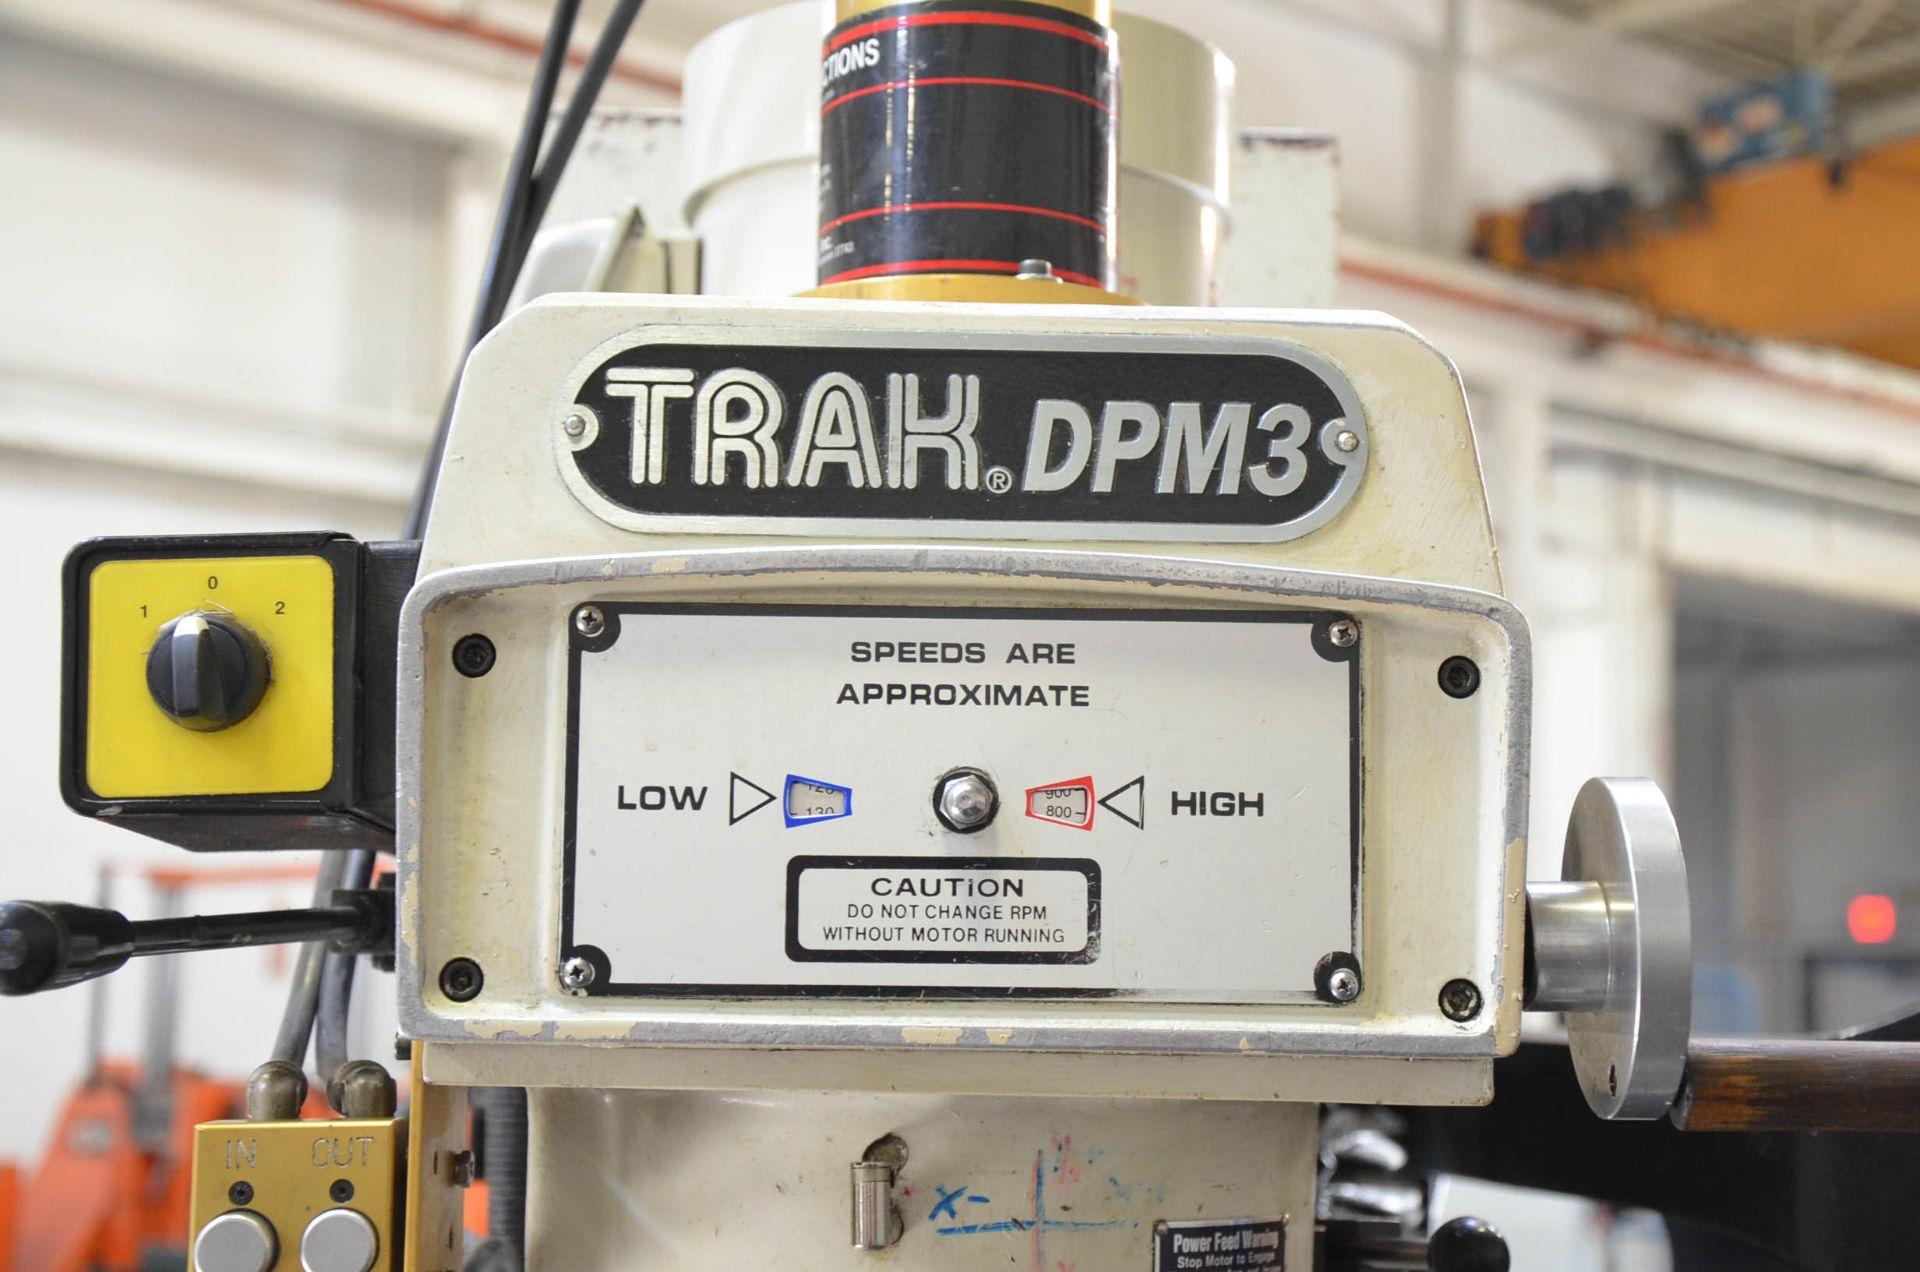 "TRAK DPM3 CNC VERTICAL TURRET MILLING MACHINE WITH PROTO TRAK (2007) SMX CNC CONTROL, 10"" X 50"" - Image 3 of 7"